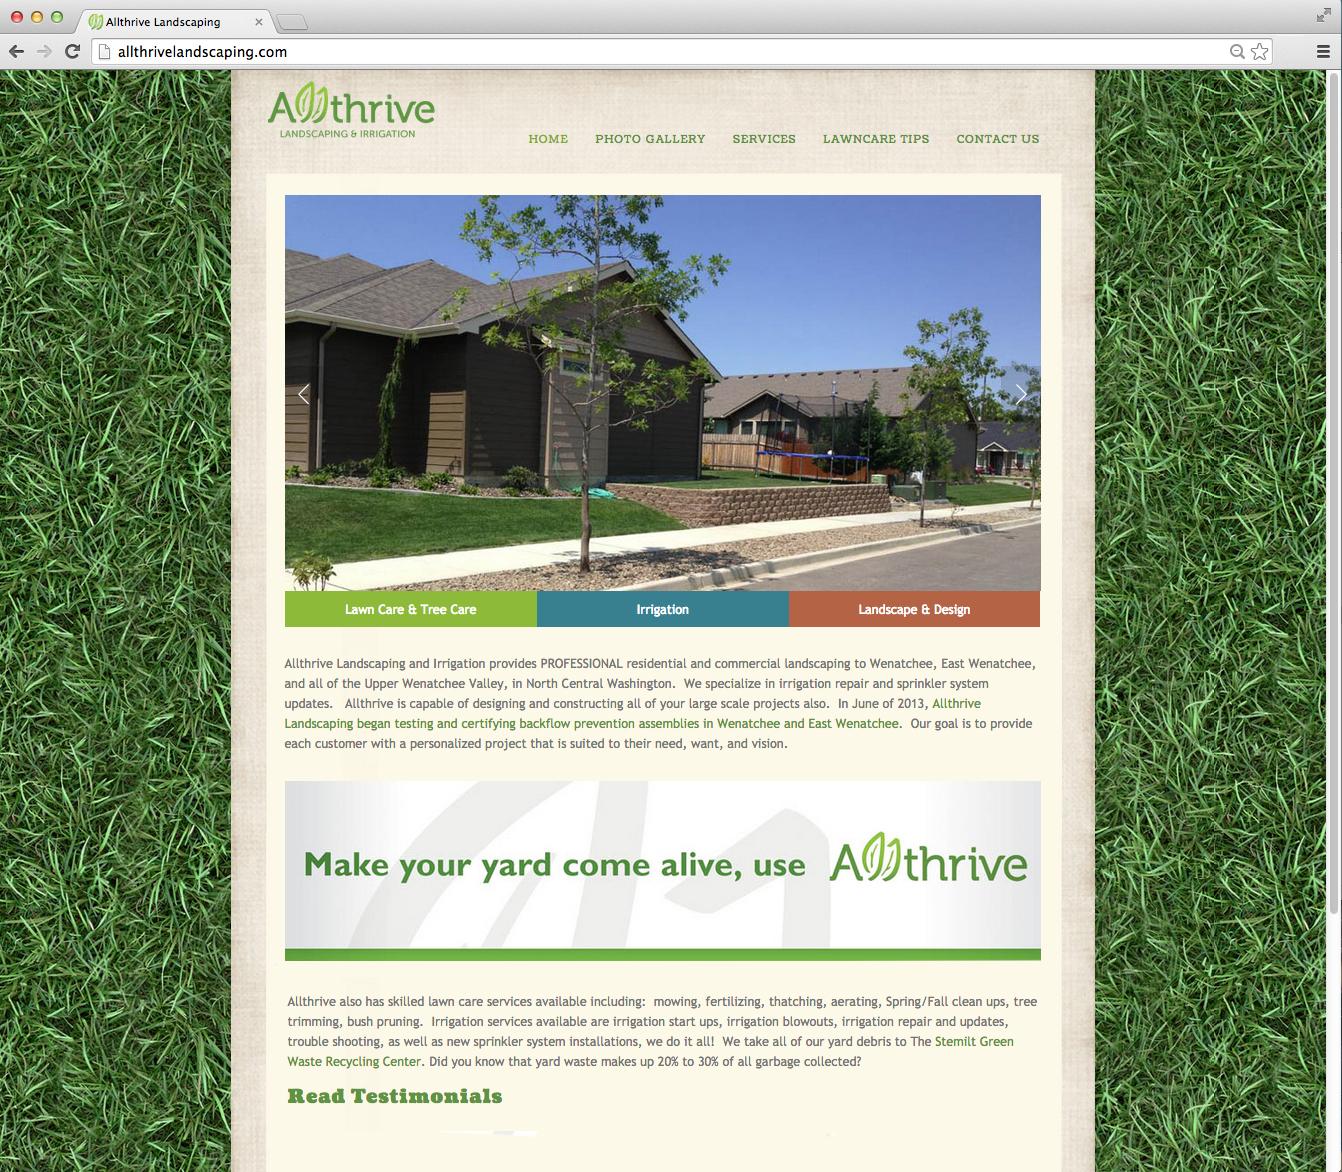 Allthrive Landscaping